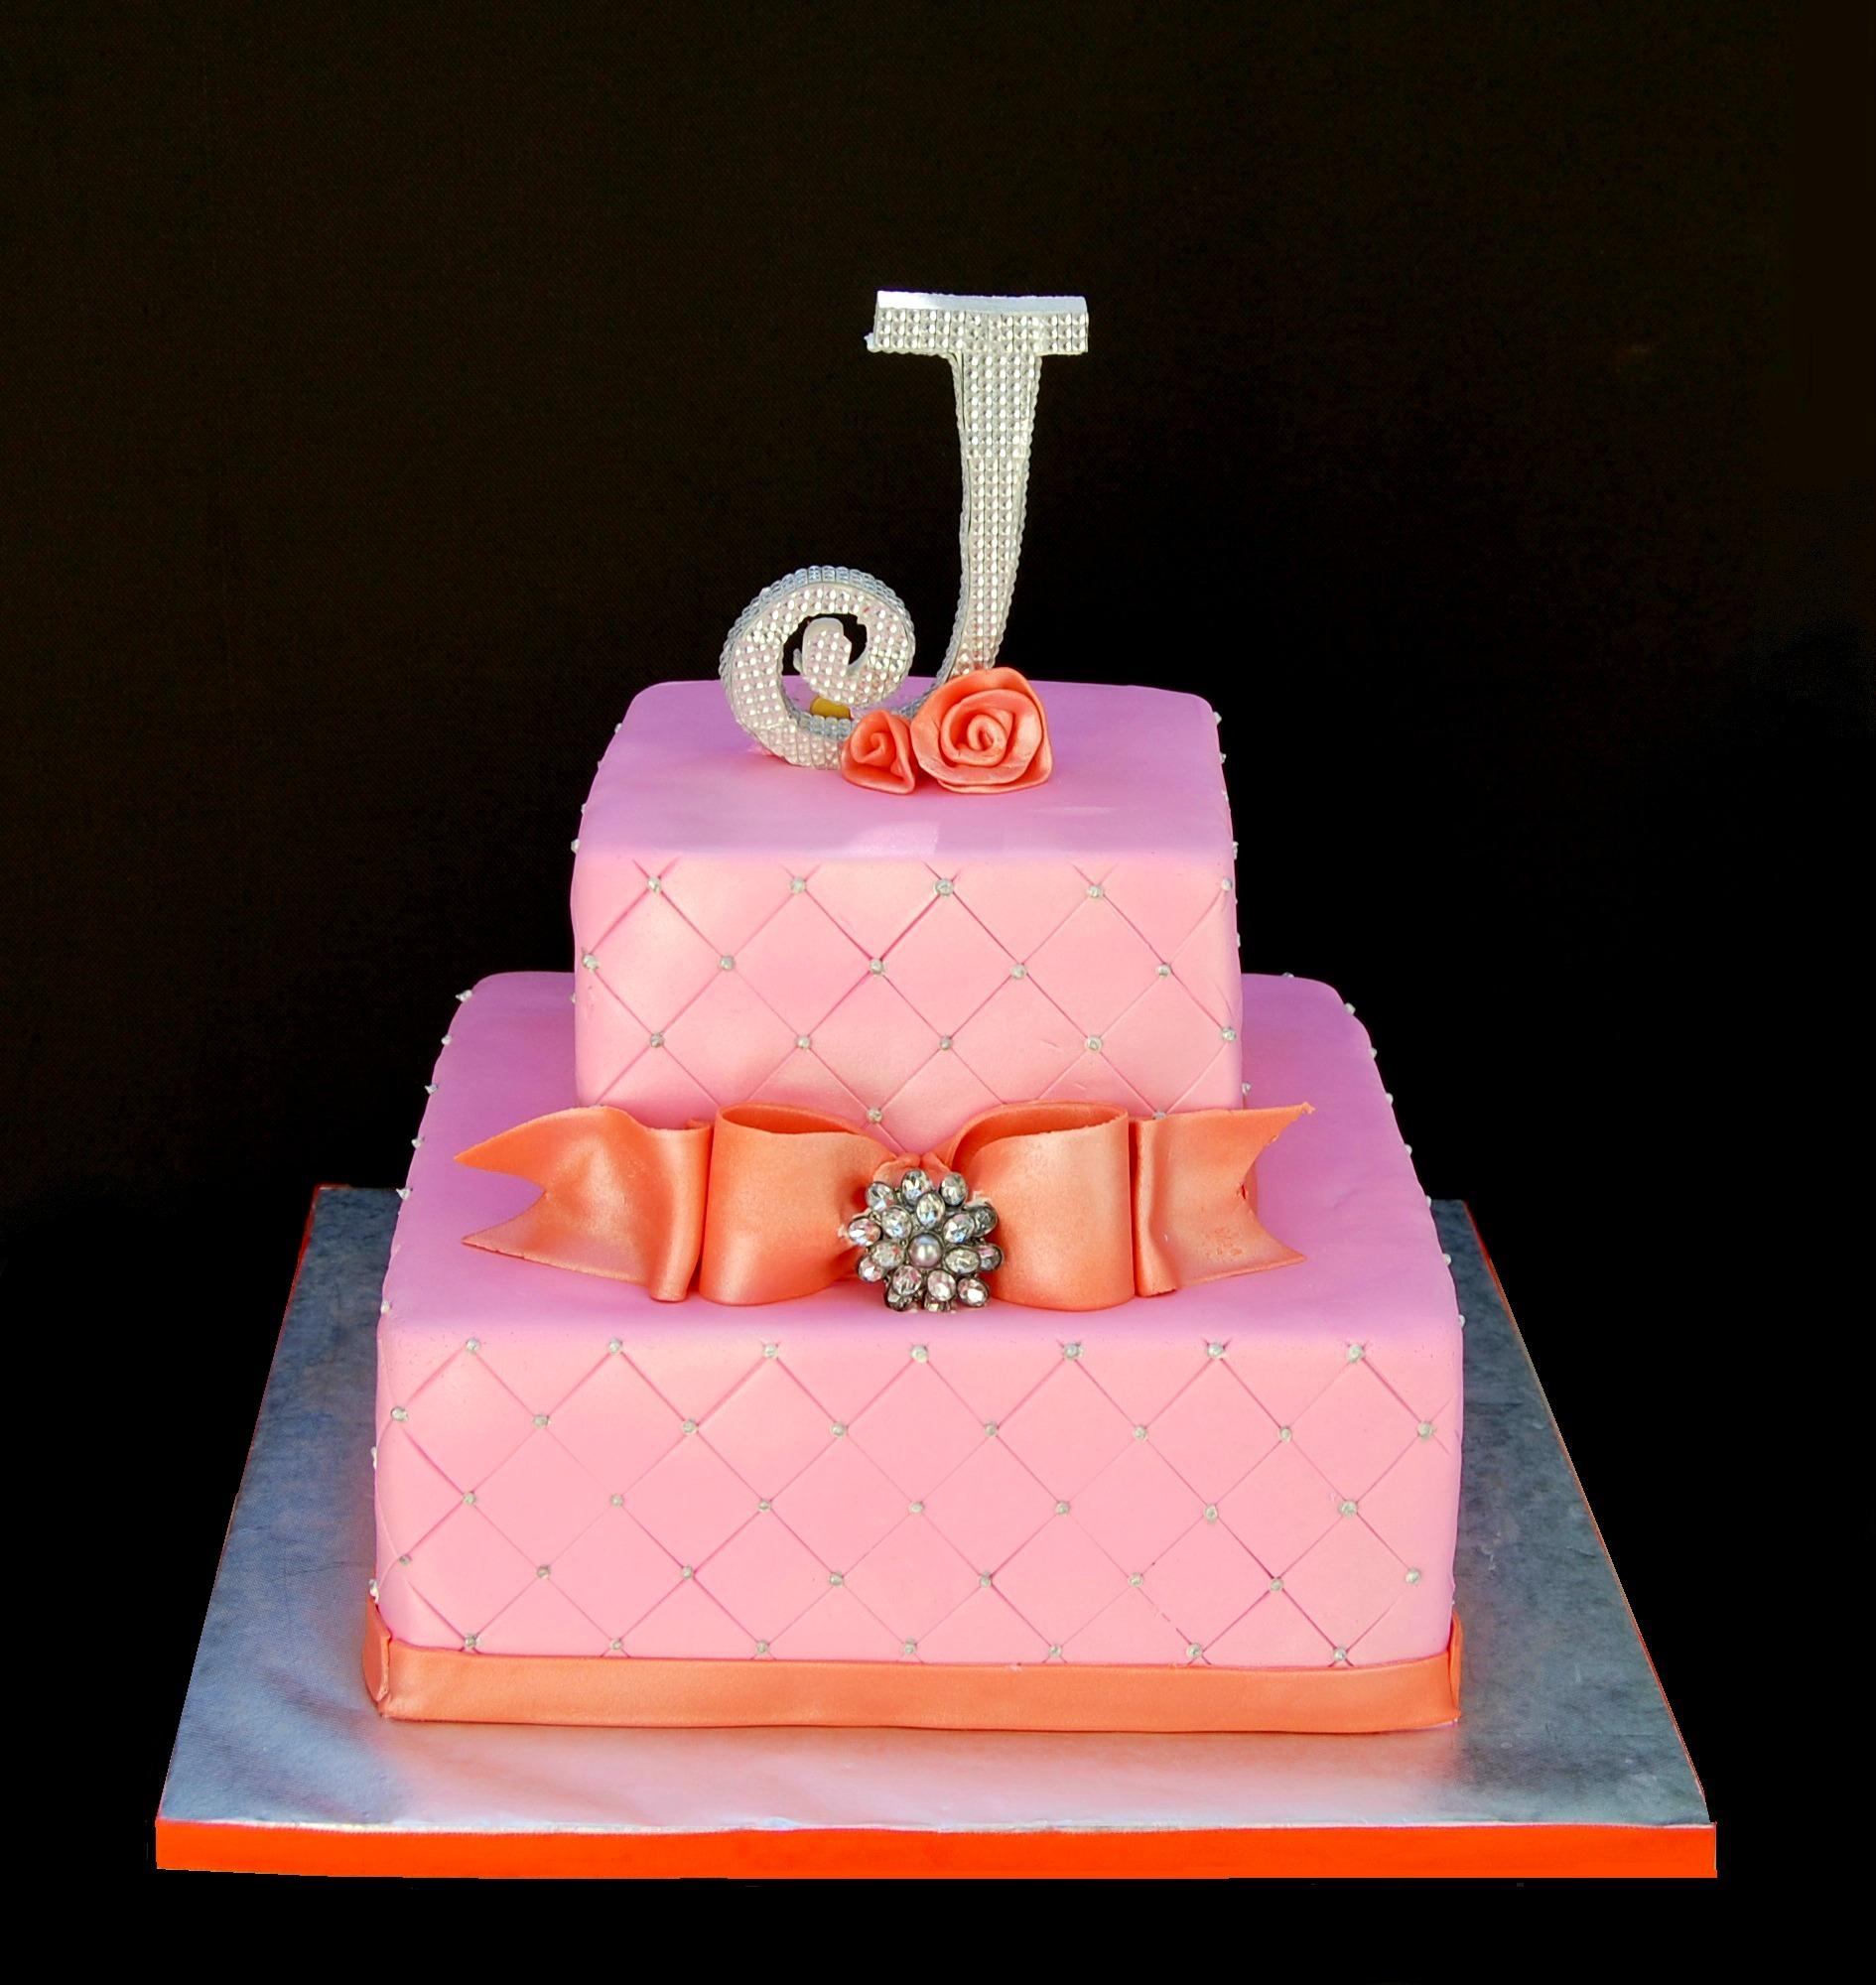 A 25th Birthday Cake